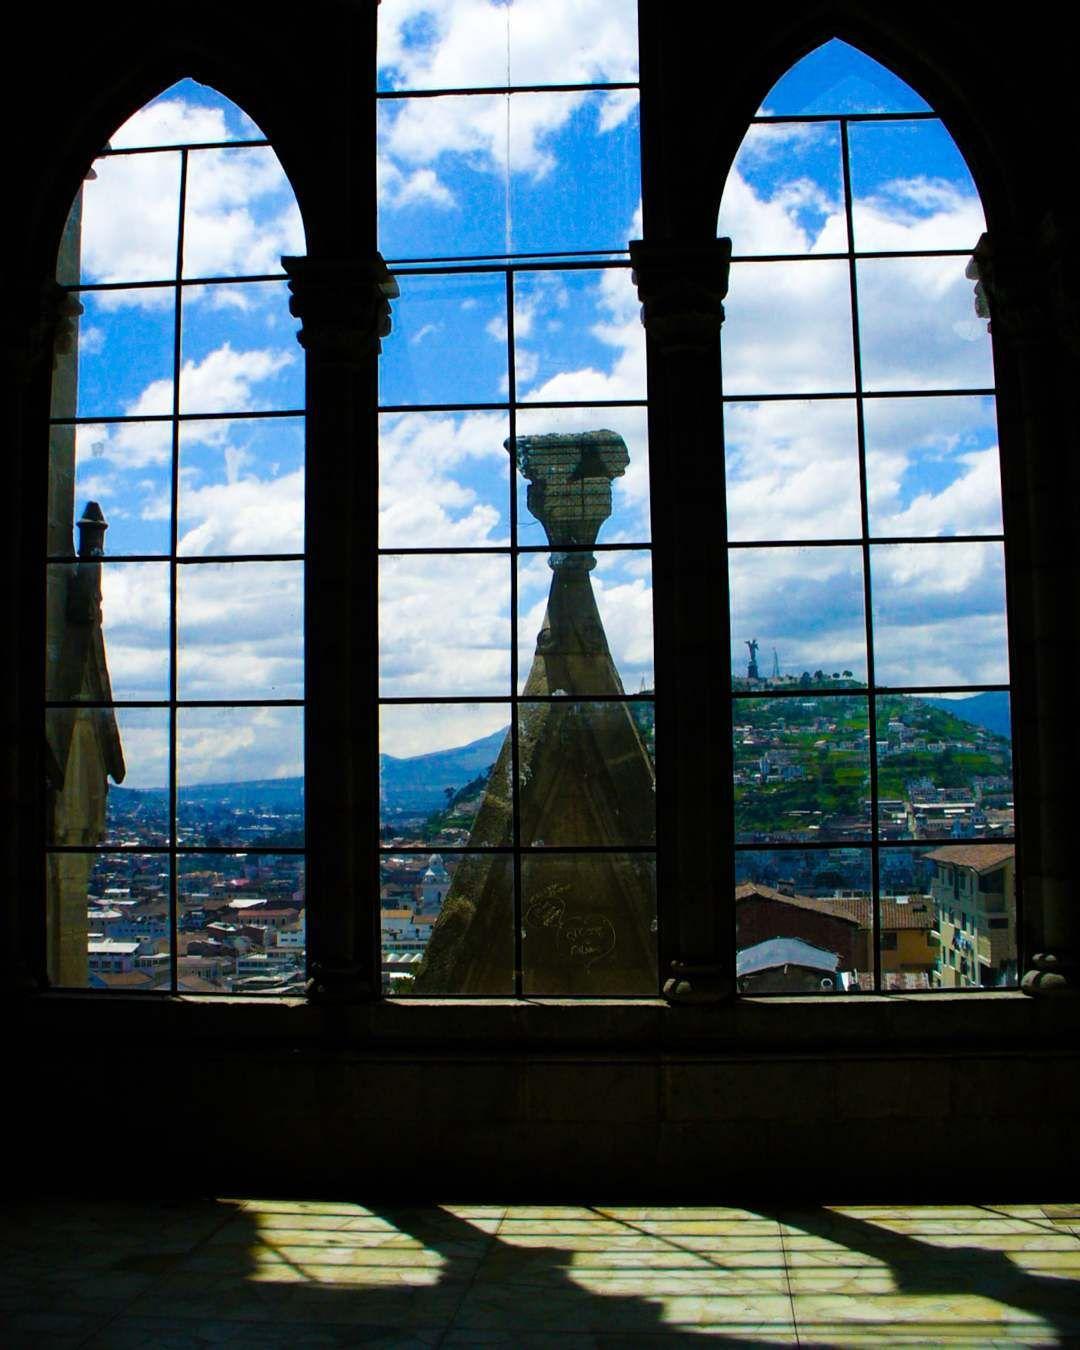 #viajero #perfectday #voyager #naturaleza #Quito #Ecuador #internacional